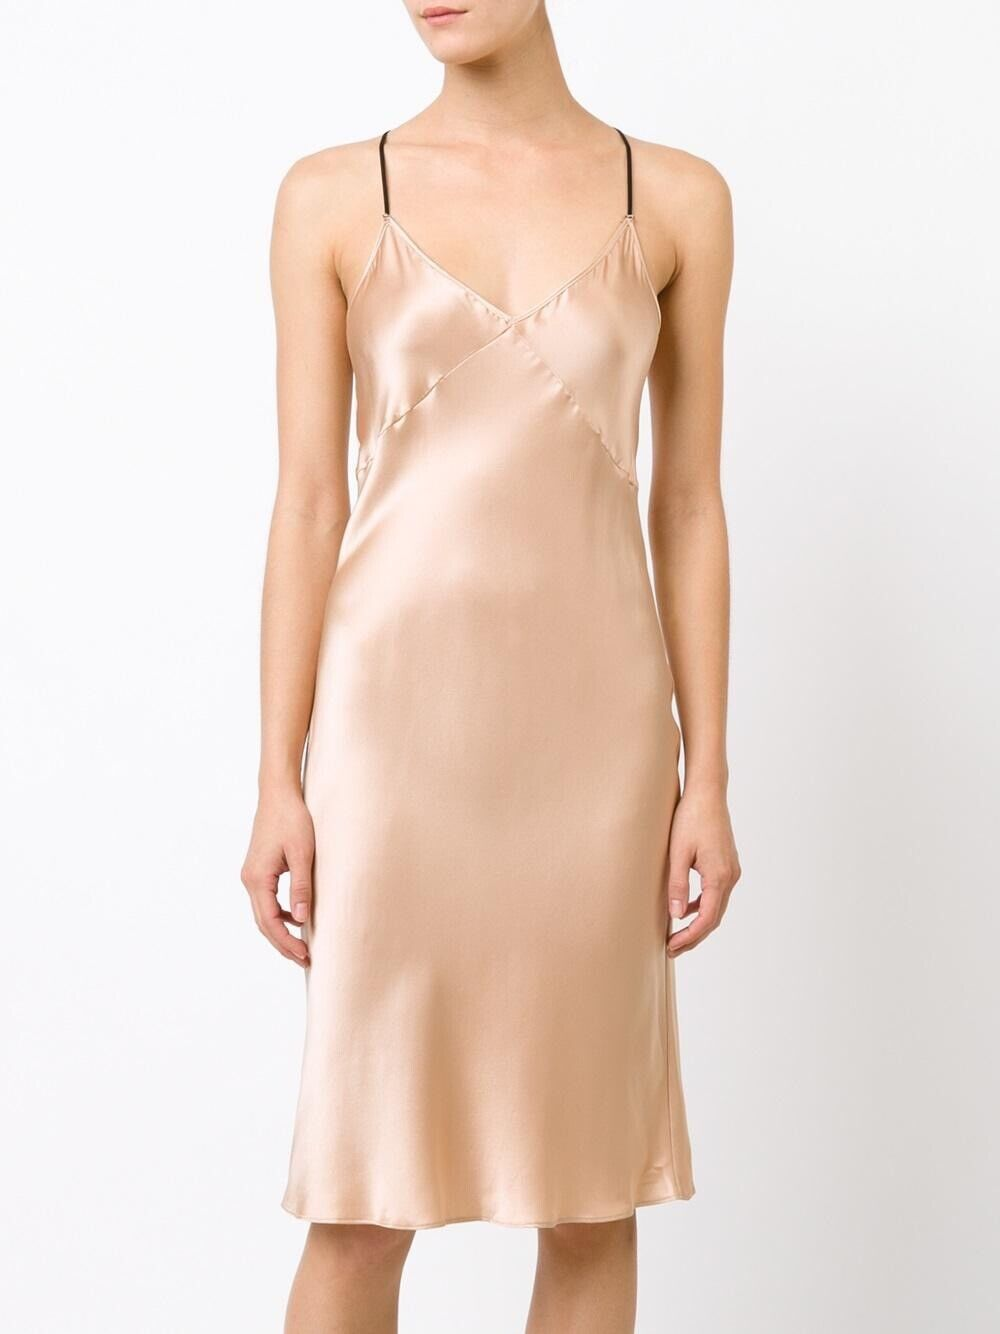 Fleur Du Mal Silk Nude T Strap glida Dress NWT SZ XS Ret  500